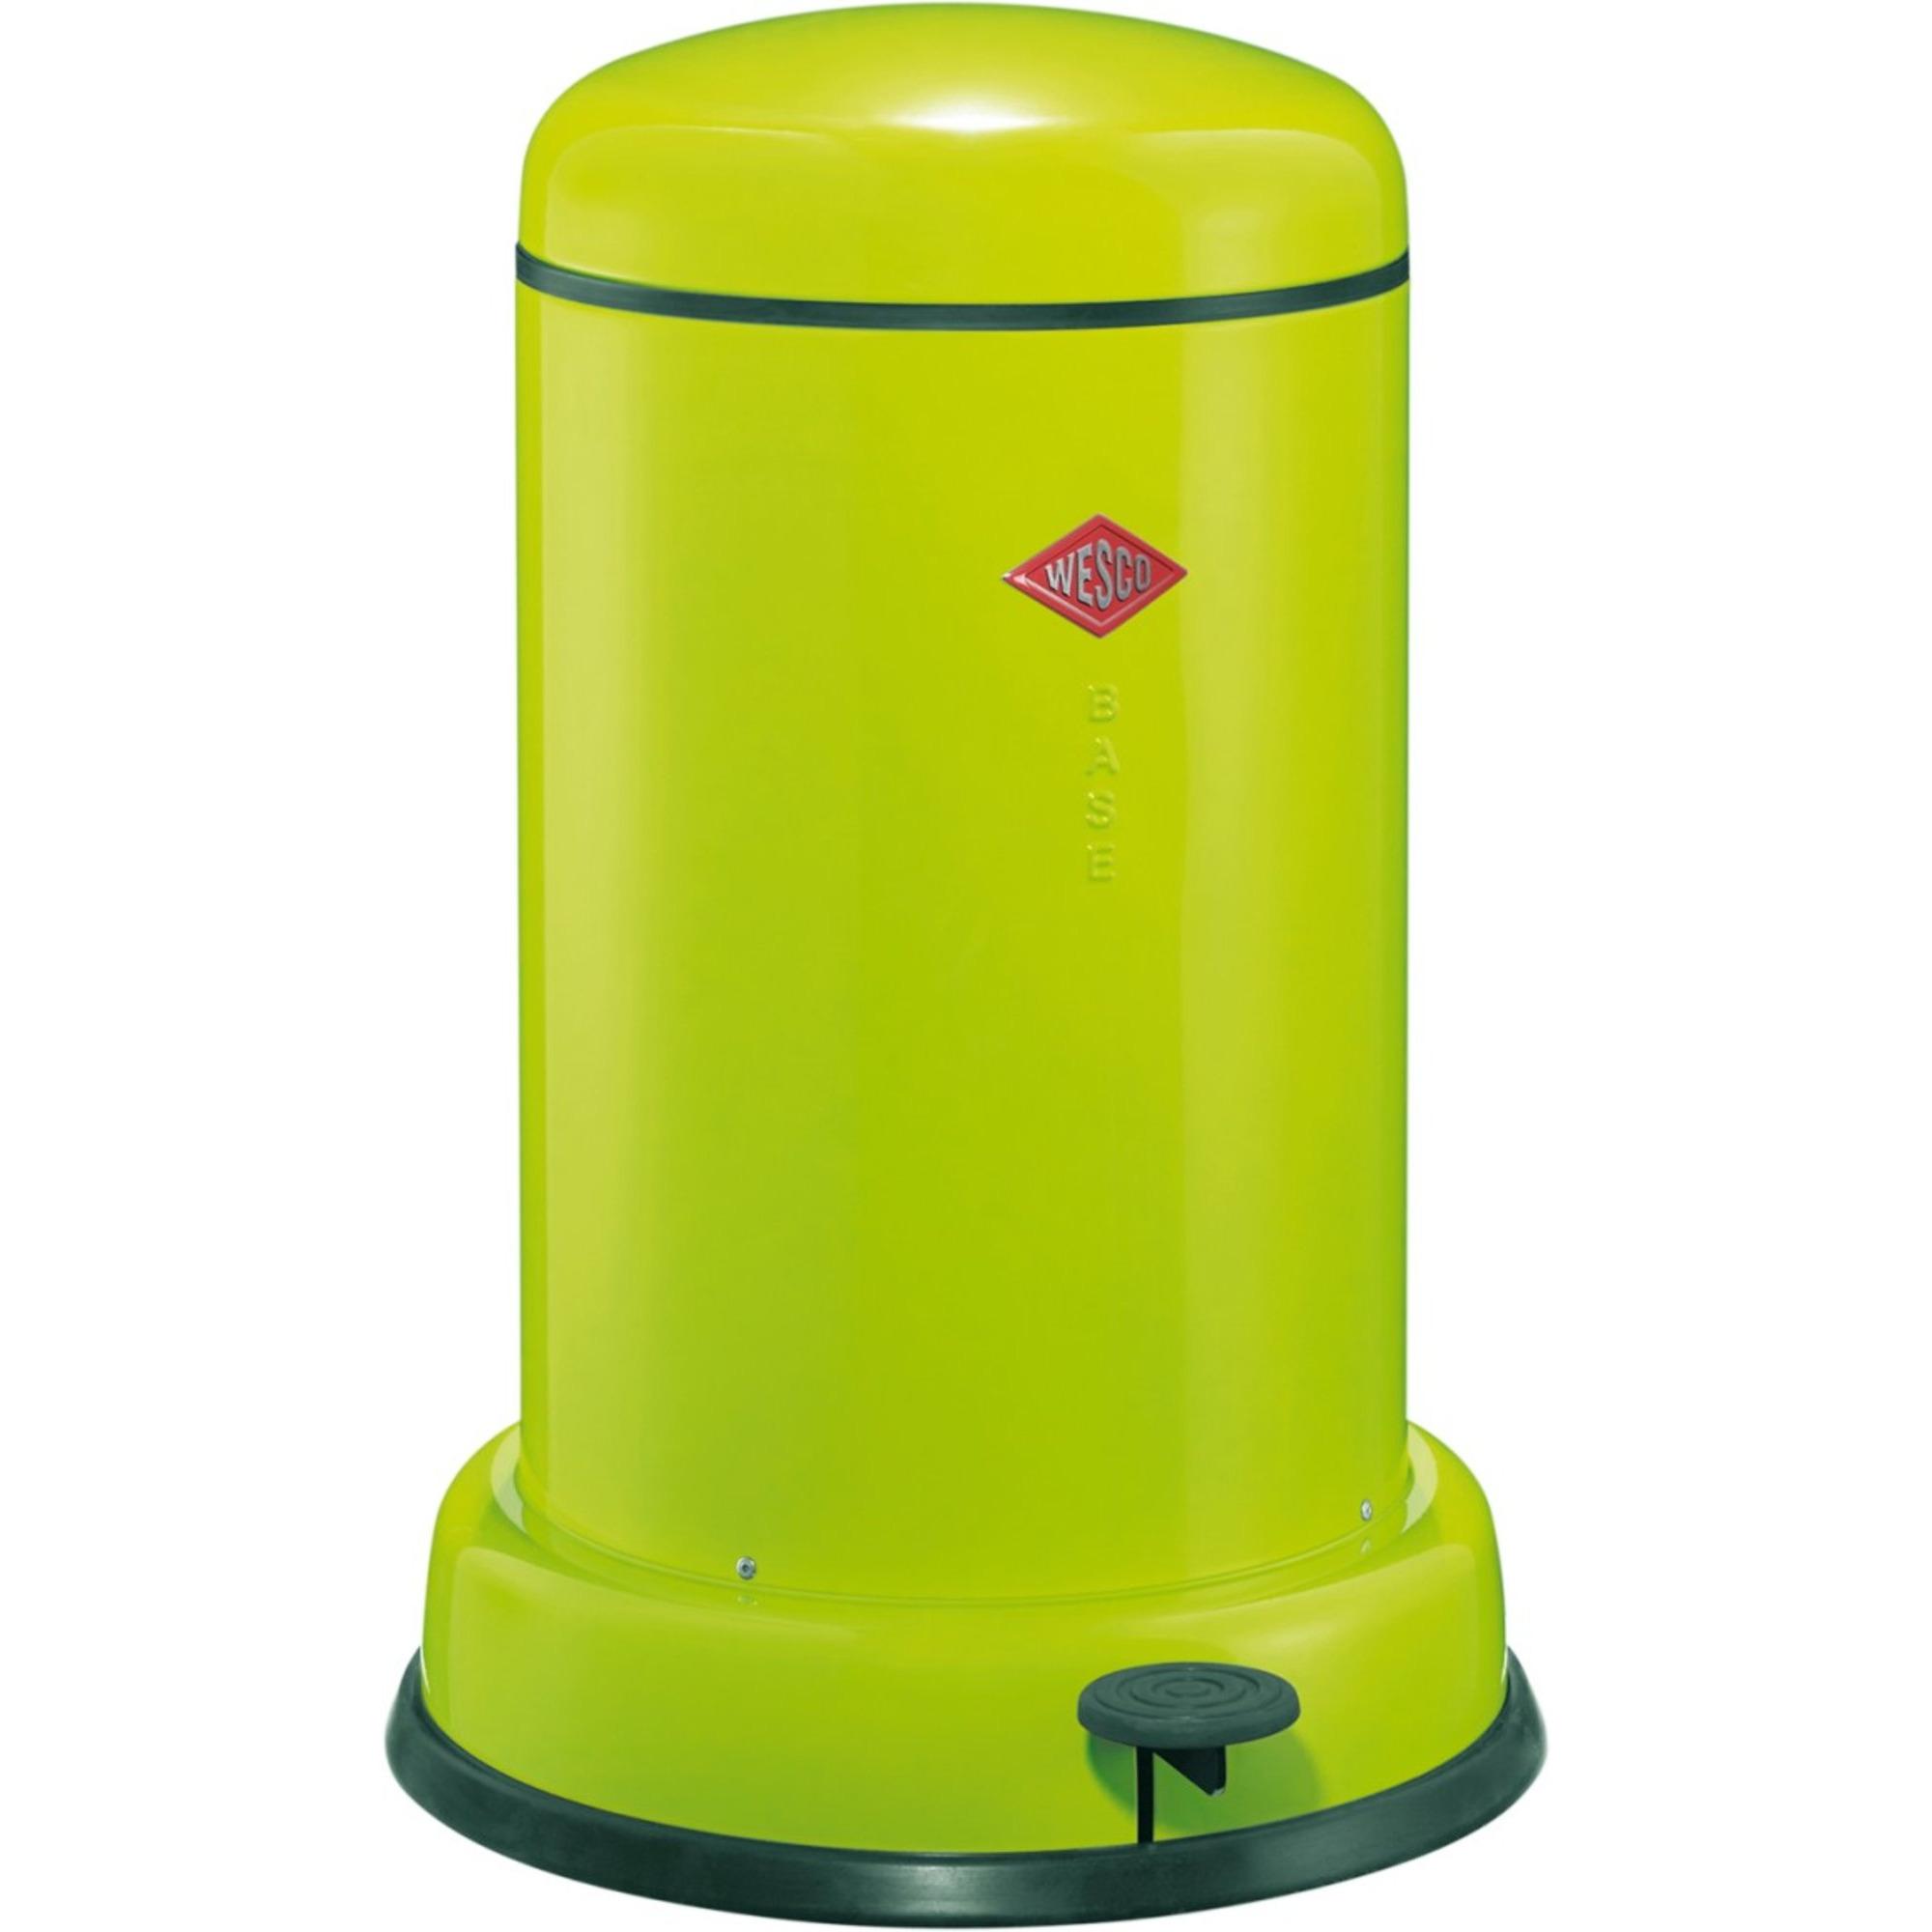 Wesco 15 liter Baseboy Lime